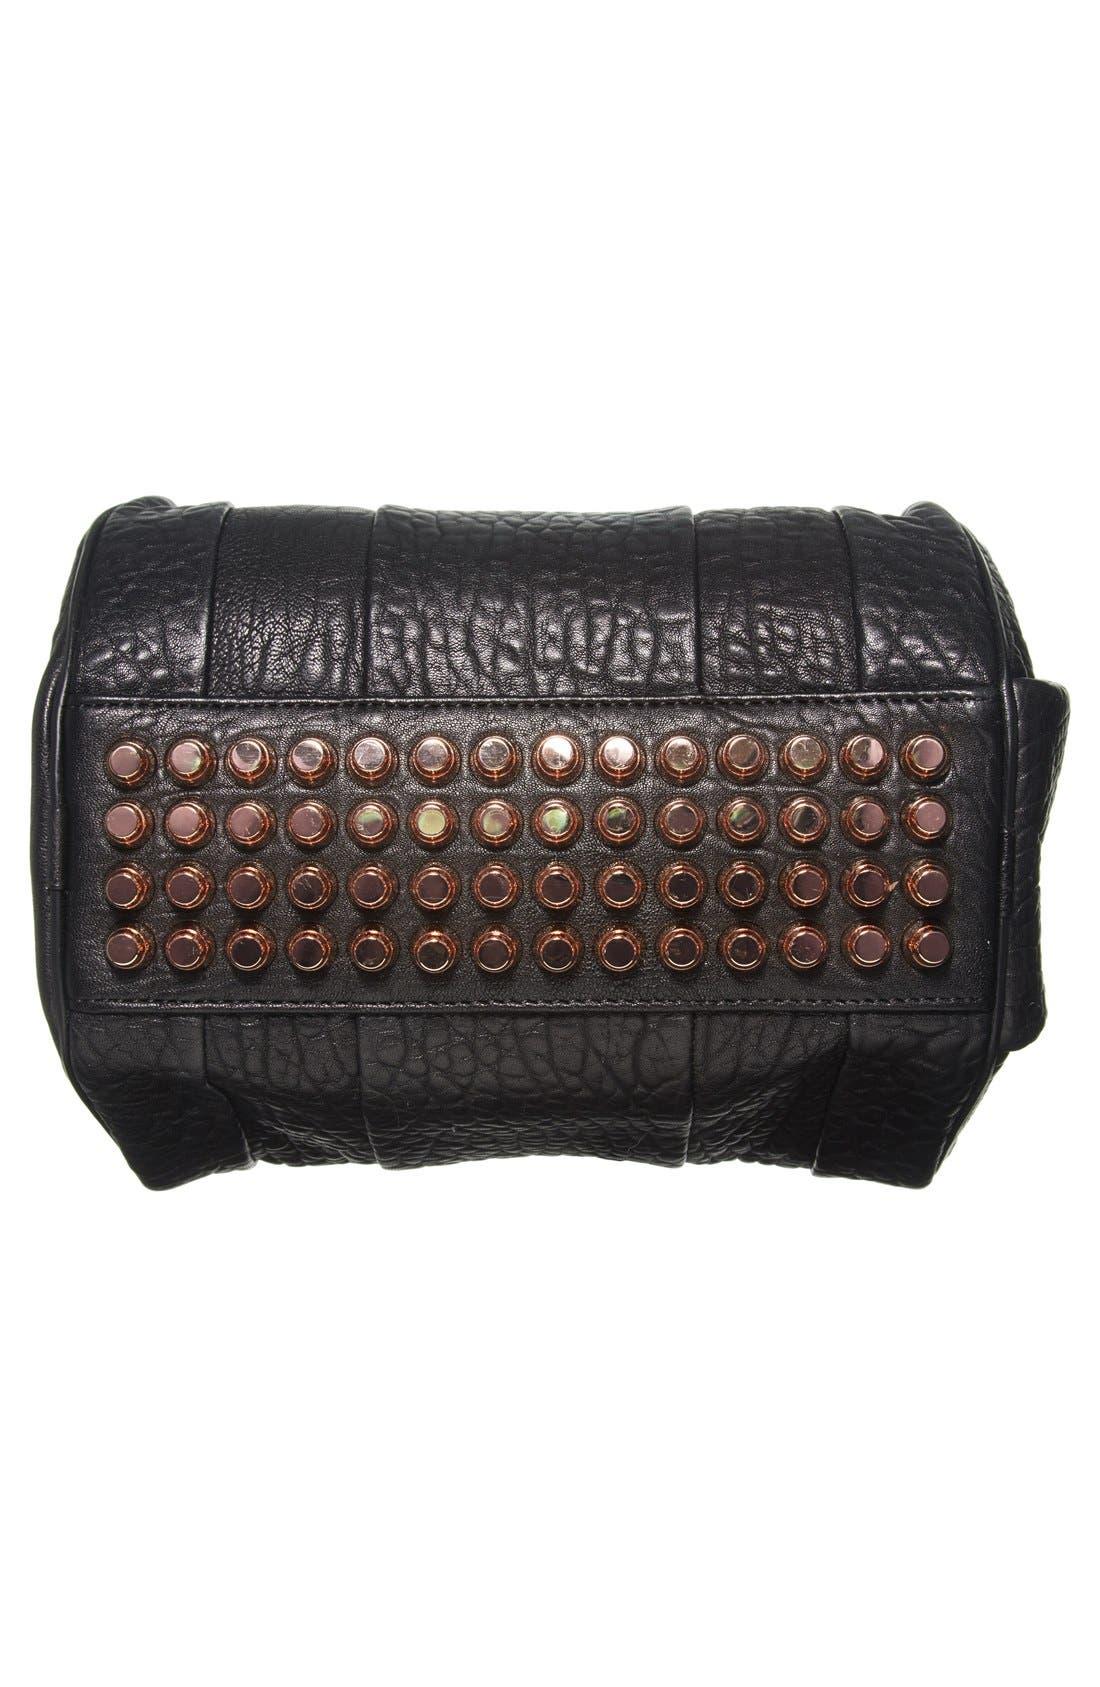 ALEXANDER WANG, 'Rockie - Rose Gold' Leather Crossbody Satchel, Alternate thumbnail 6, color, BLACK ROSE GLD HRDWRE